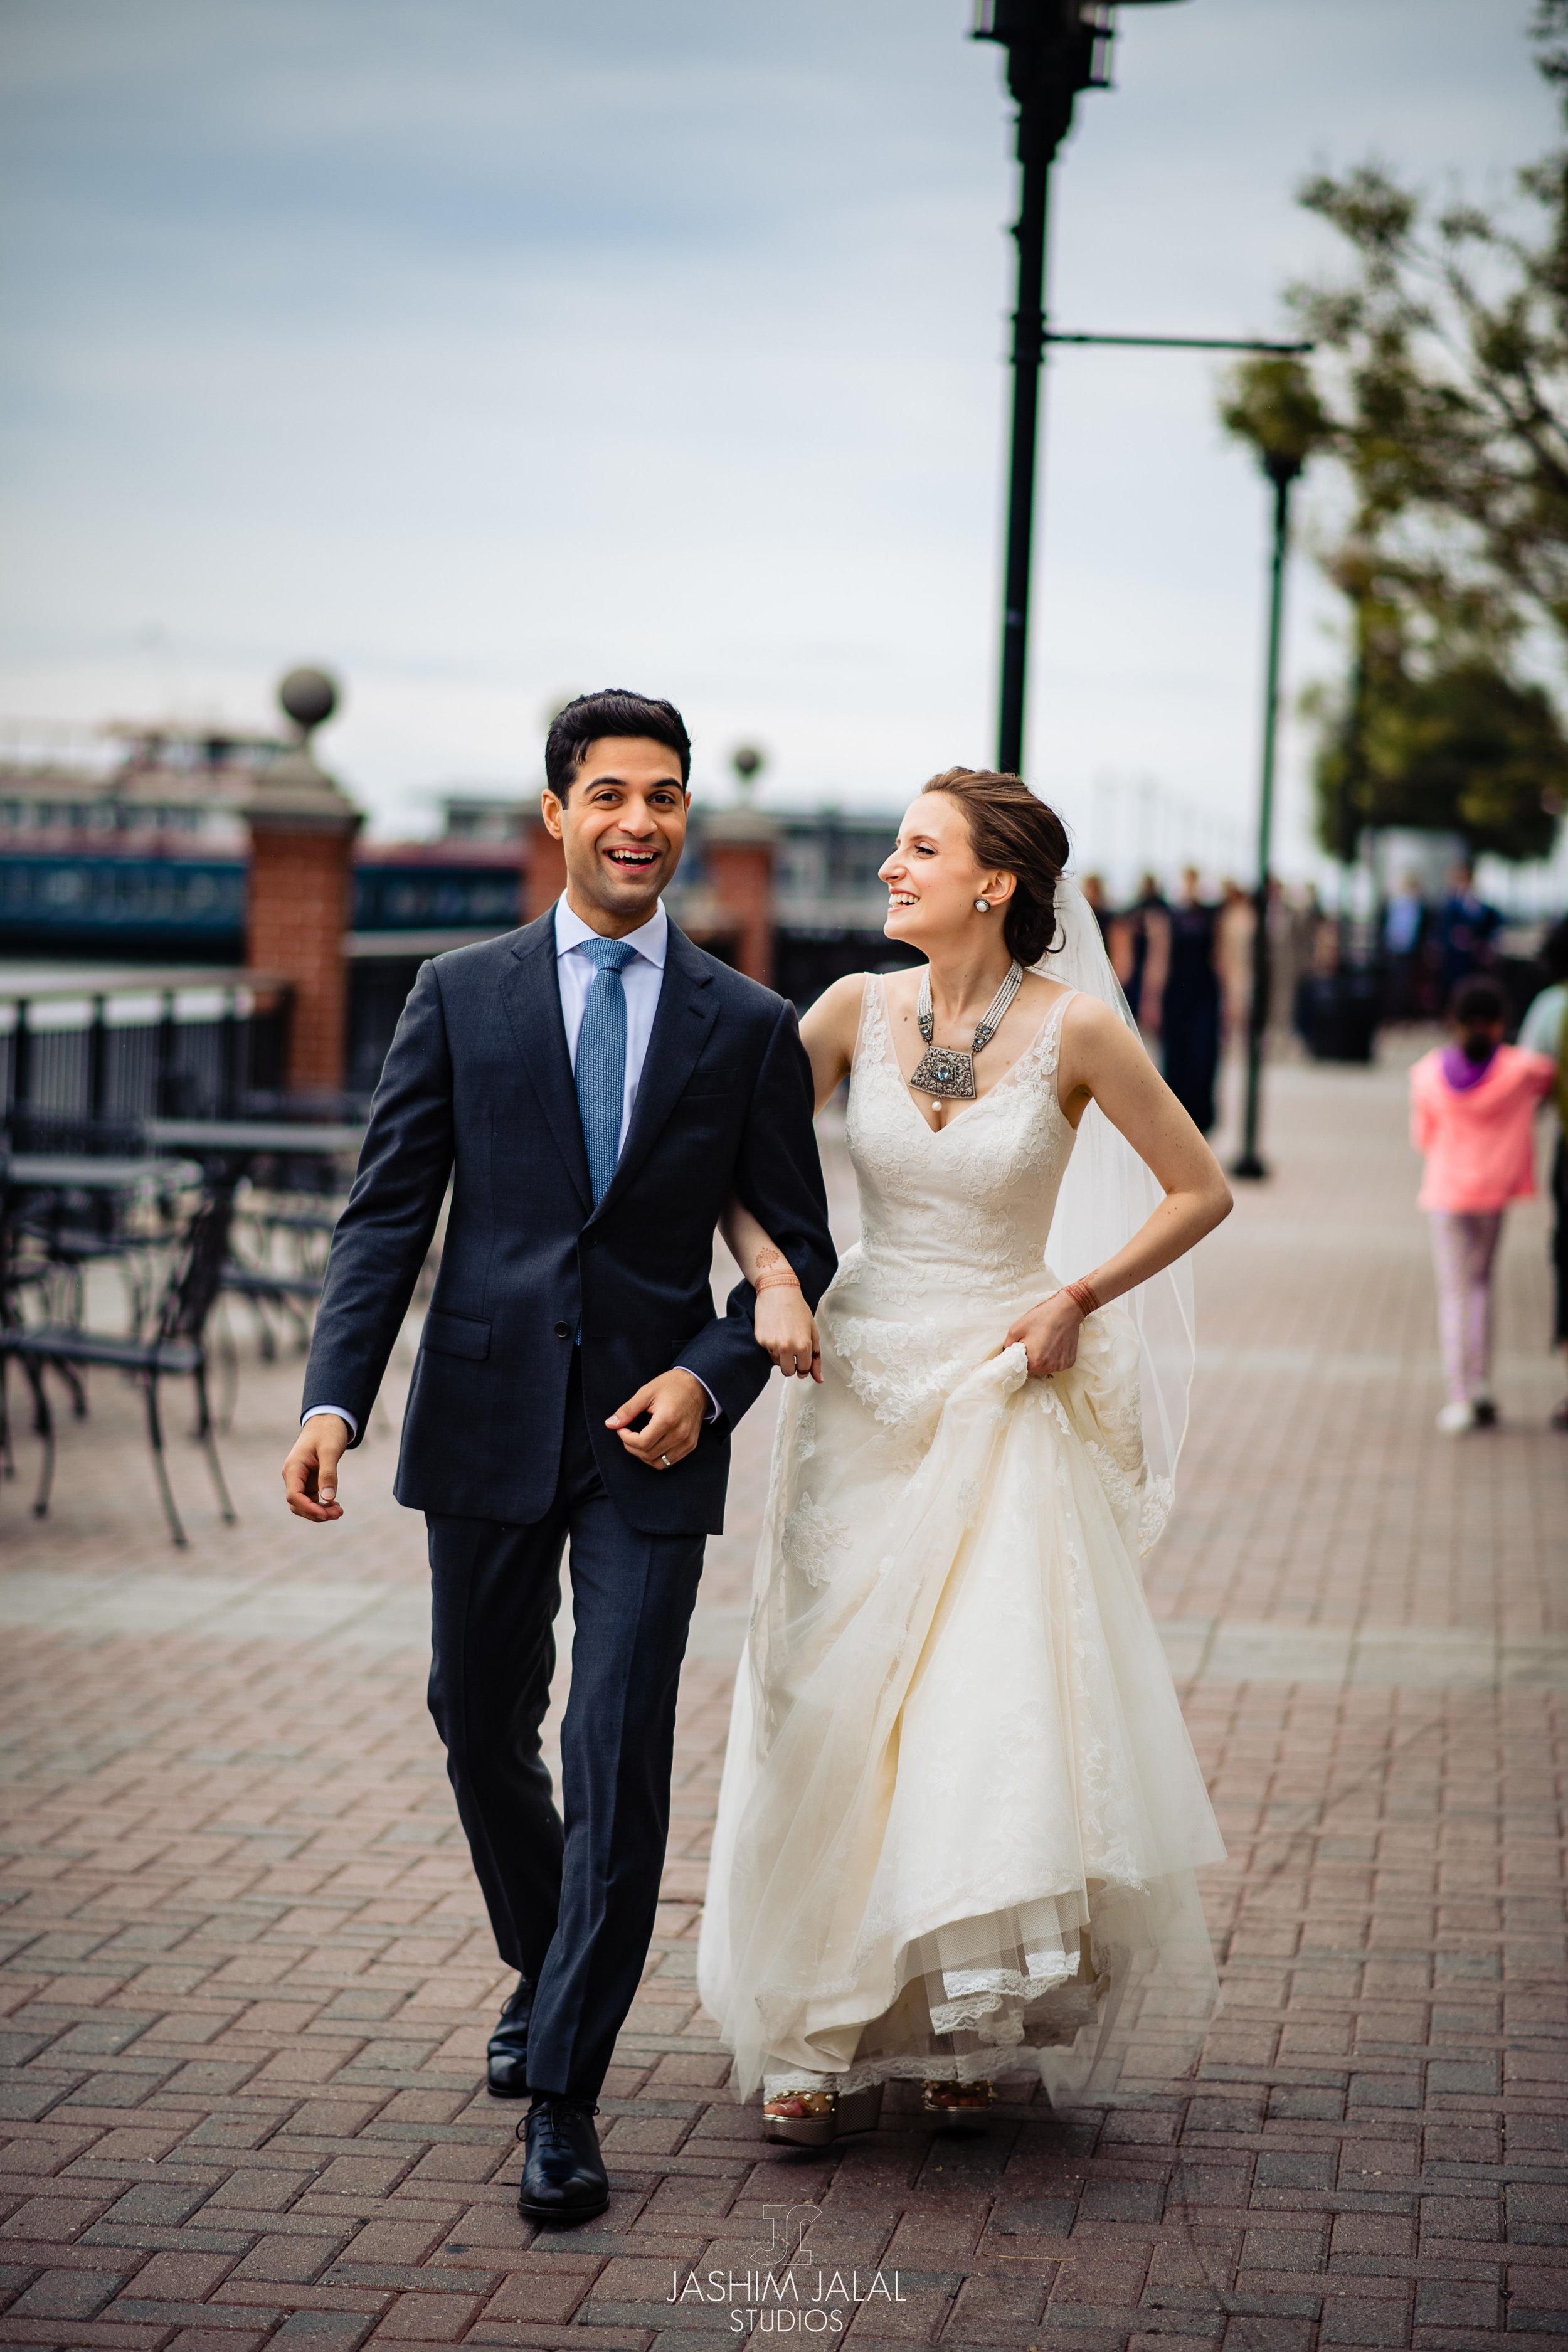 INDIAN WEDDING CIVIL CEREMONY BRIDE AND GROOM.jpg